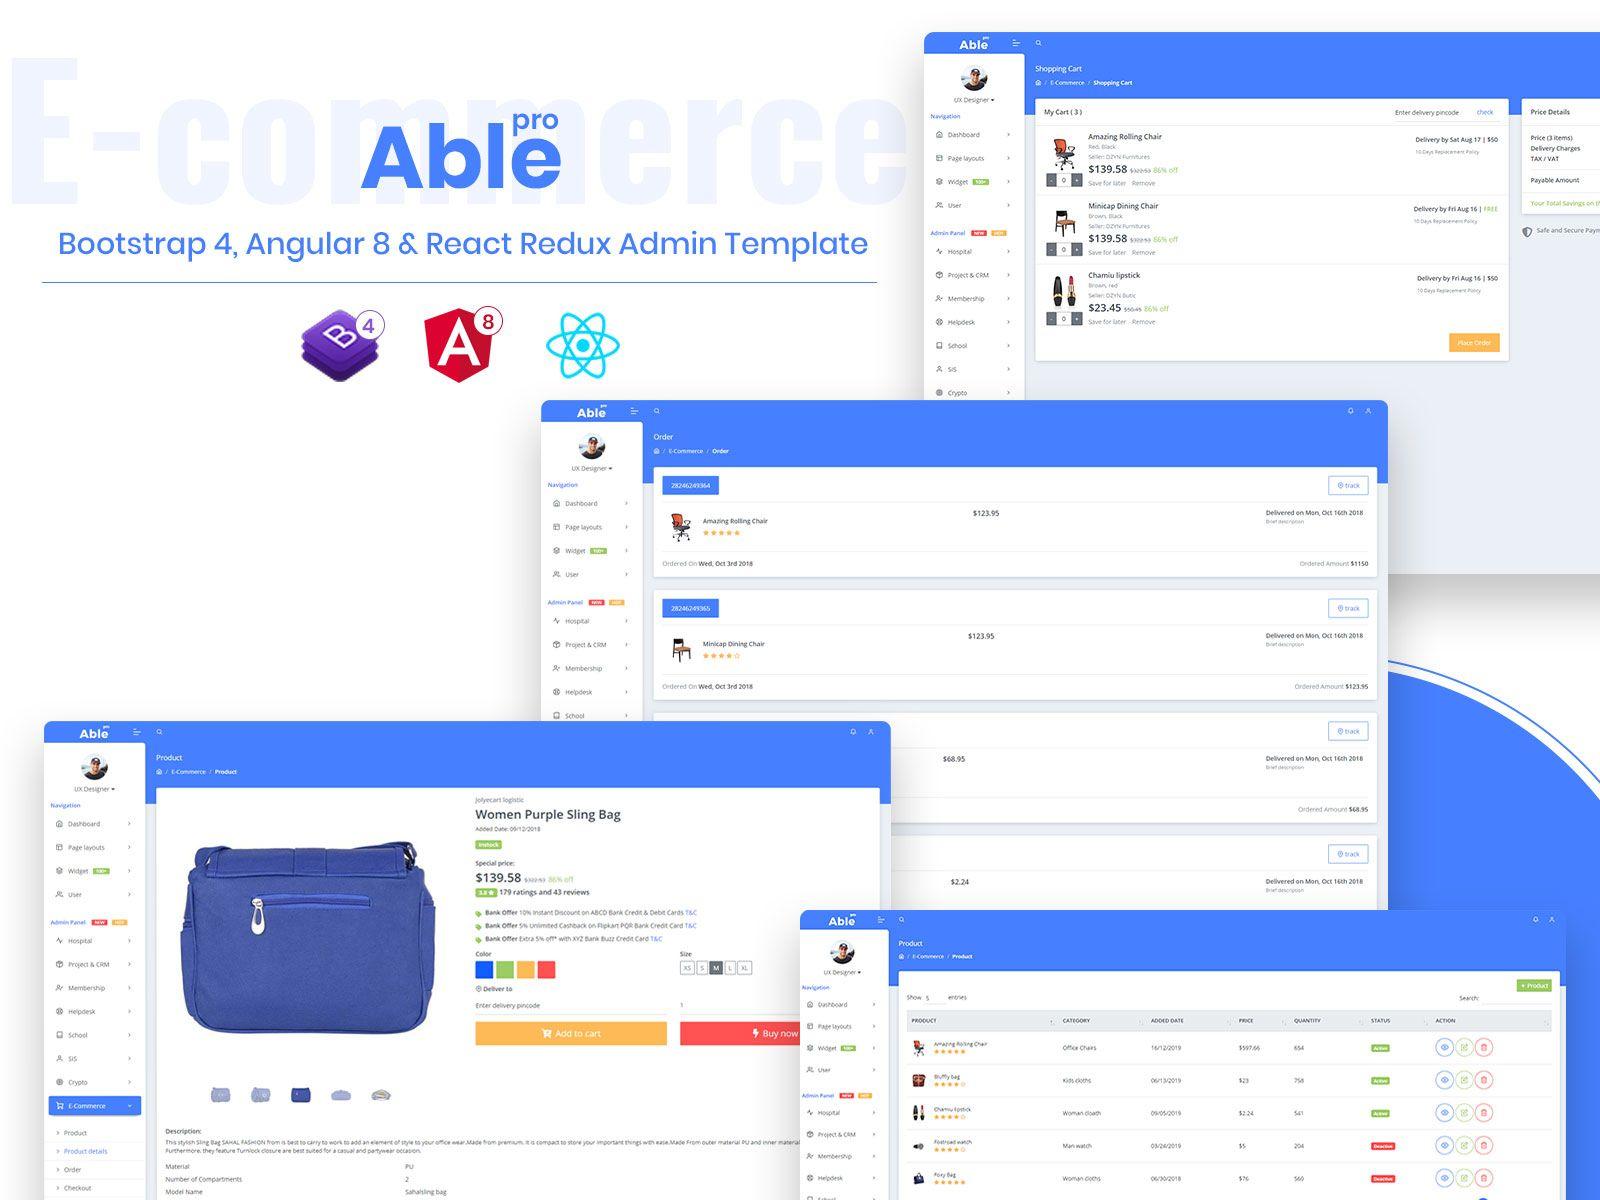 Able Pro 8 0 Bootstrap 4 Angular 8 React Redux Admin Template Templates Admin Angular